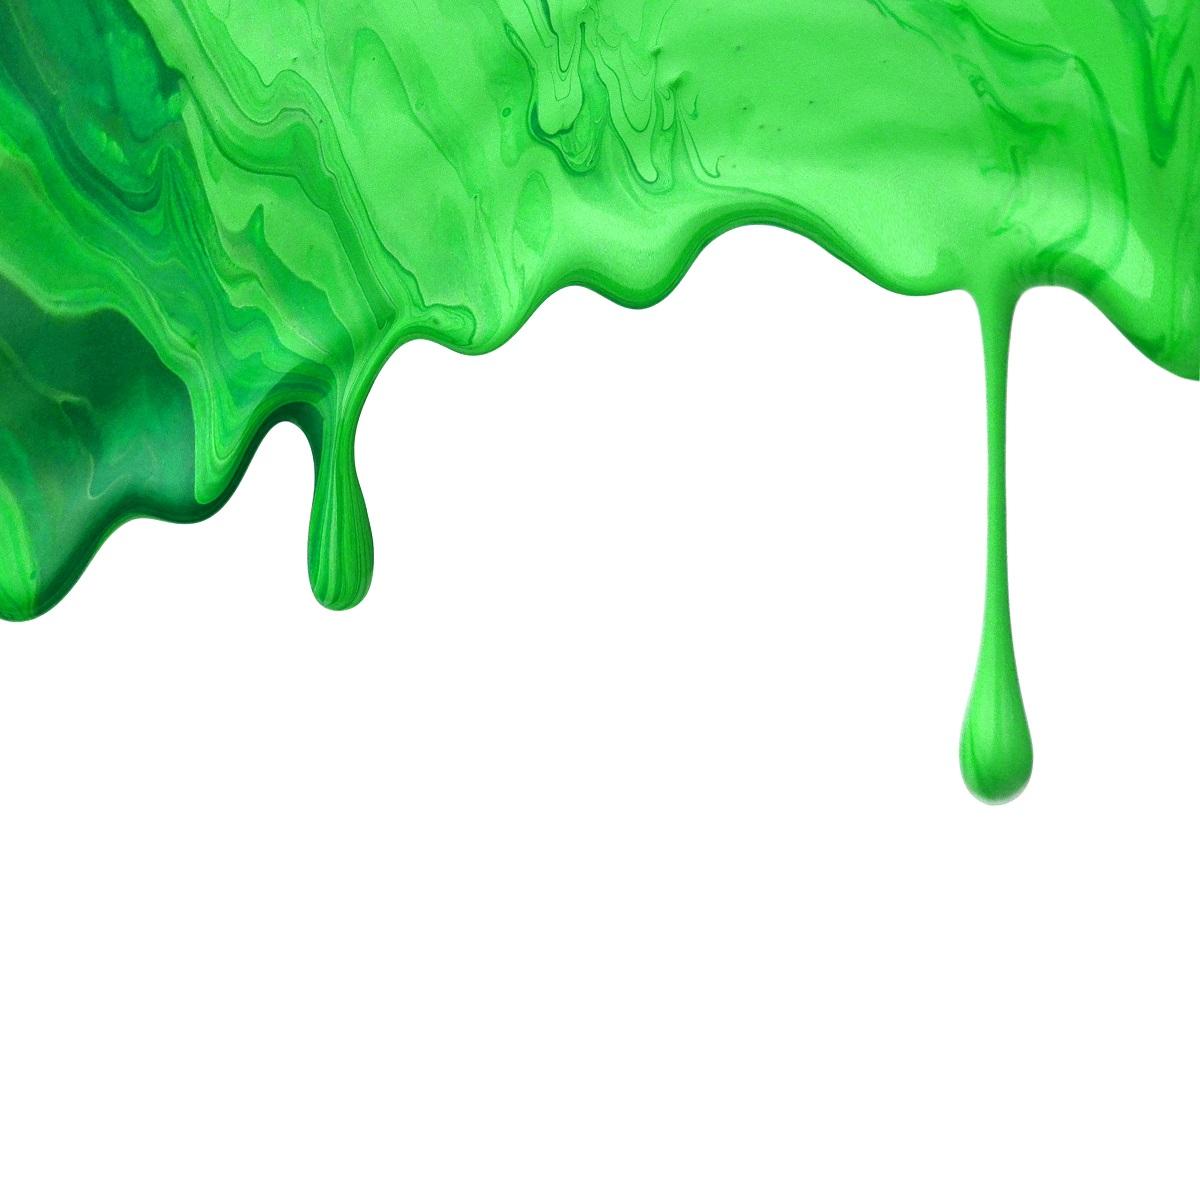 green thick liquid